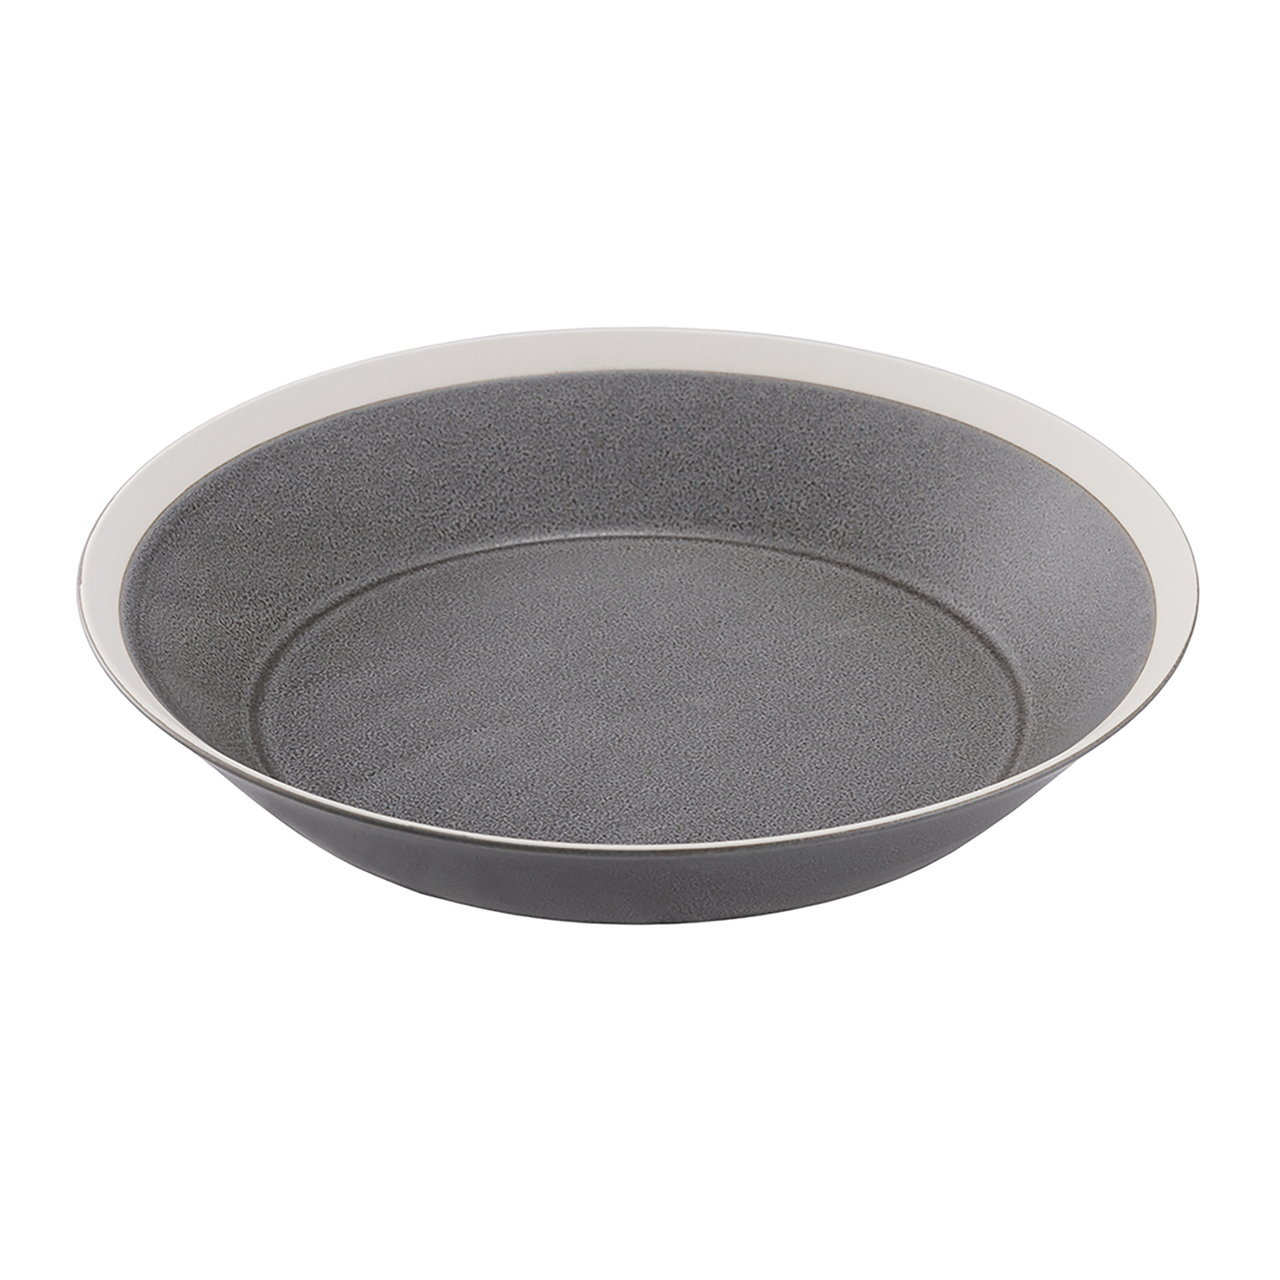 yumiko iihoshi porcelain(ユミコイイホシポーセリン)×木村硝子店 dishes 230 plate (moss gray) /matte  プレート 皿 23cm 日本製 255268